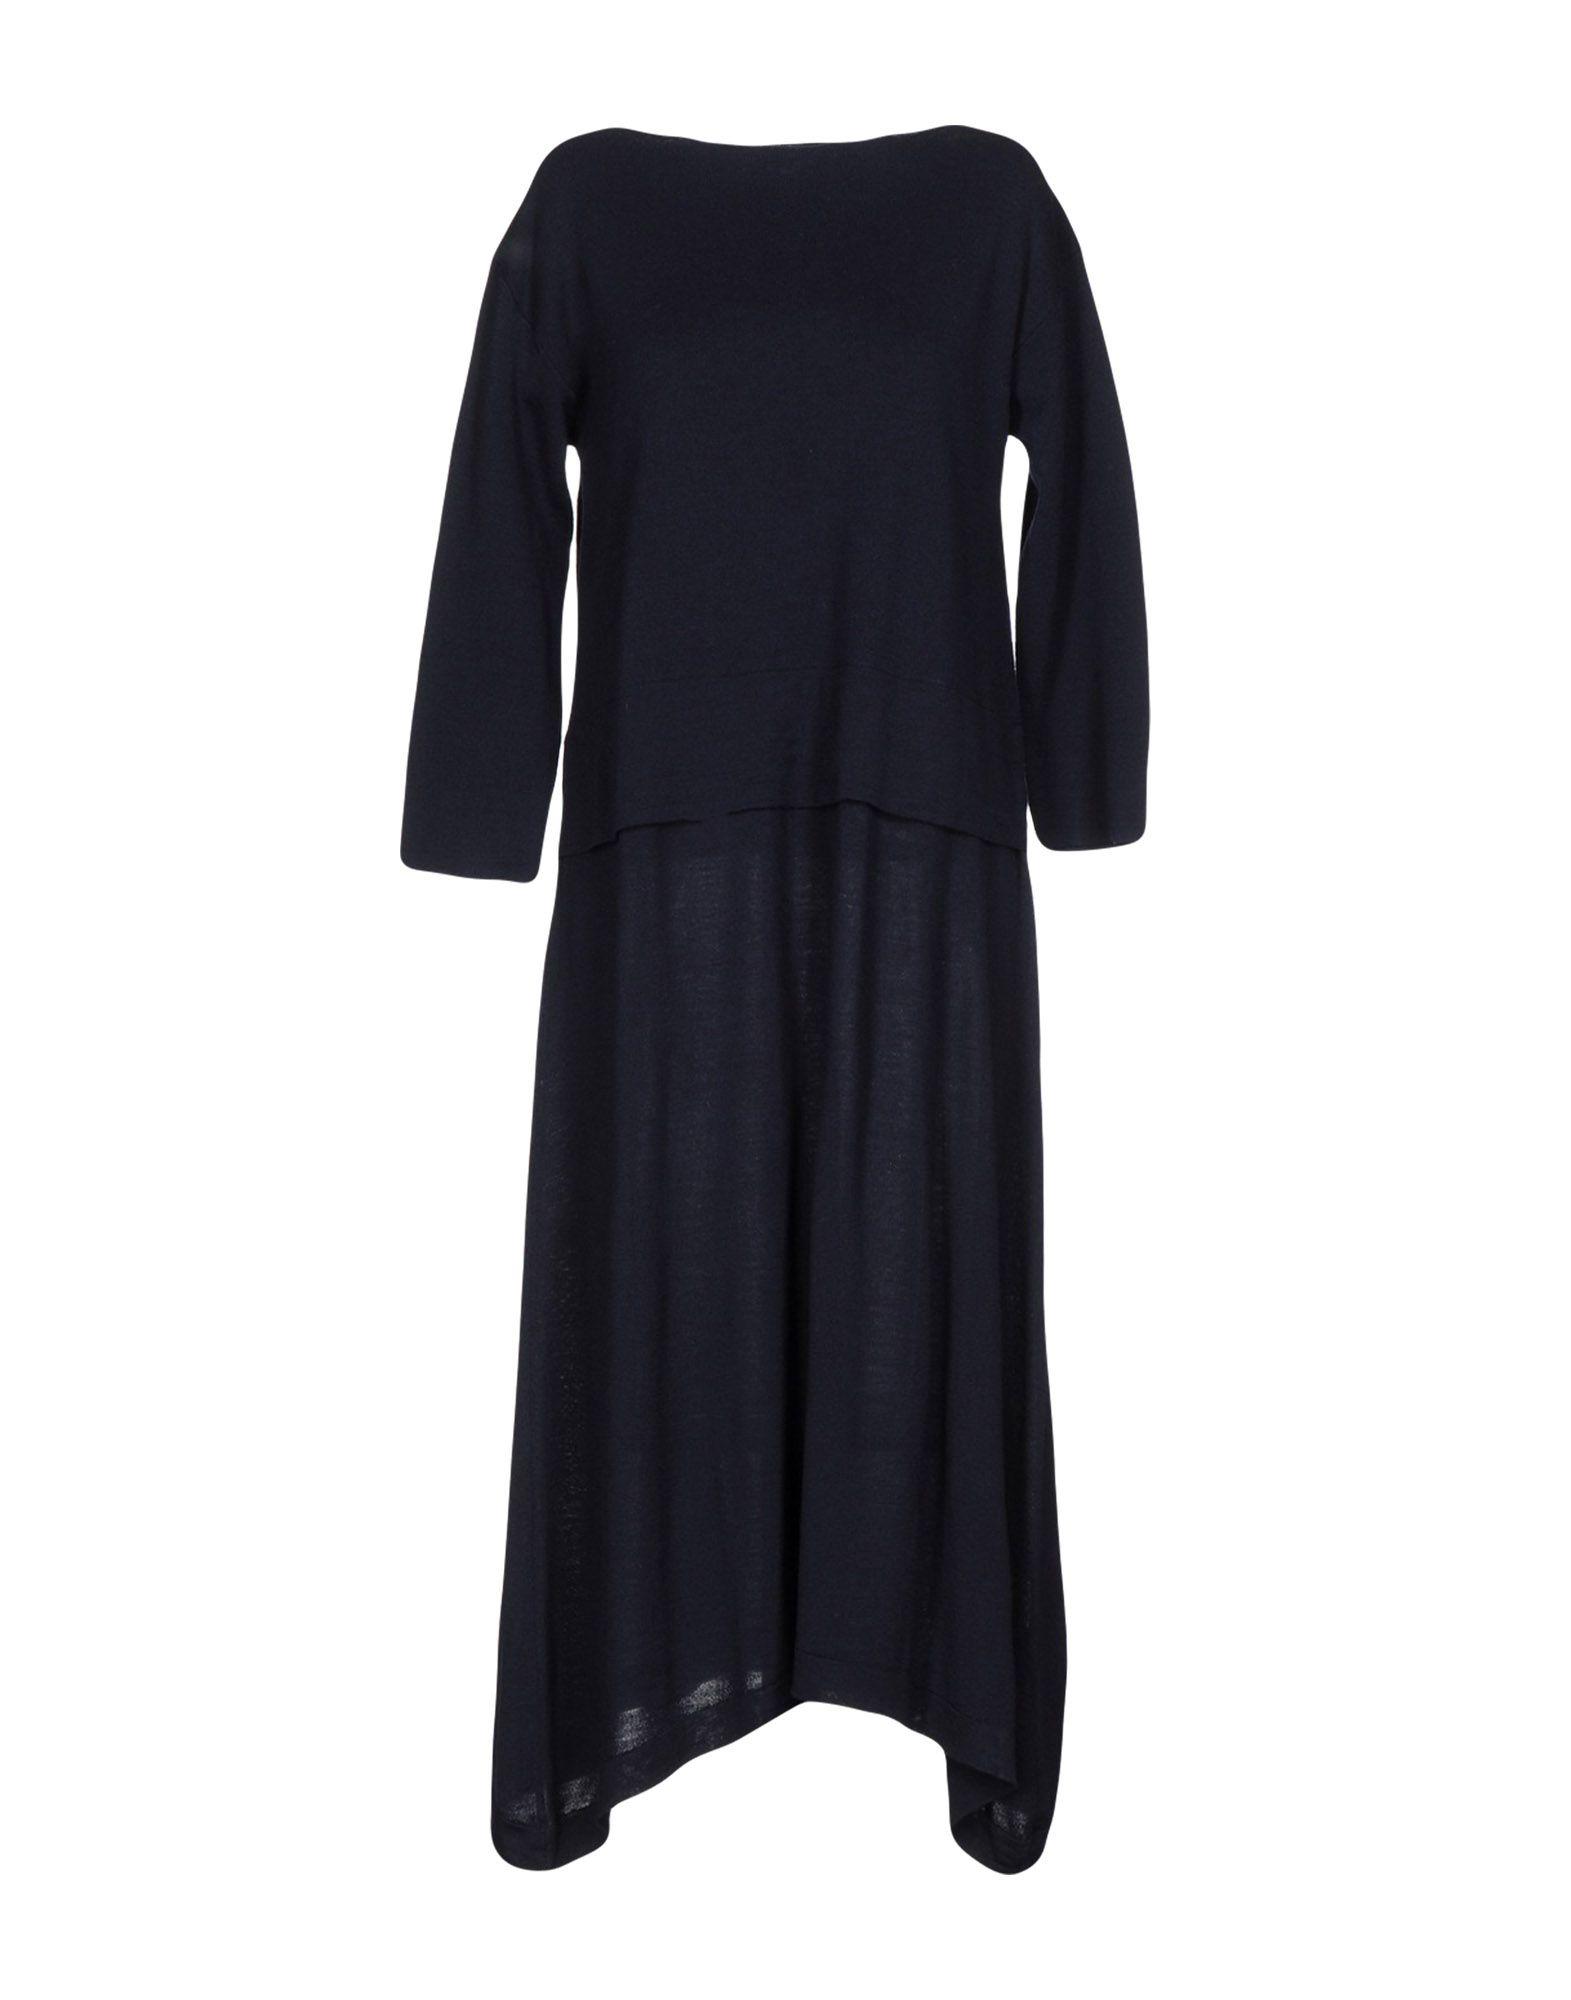 IVORIES Платье длиной 3/4 lisa corti платье длиной 3 4